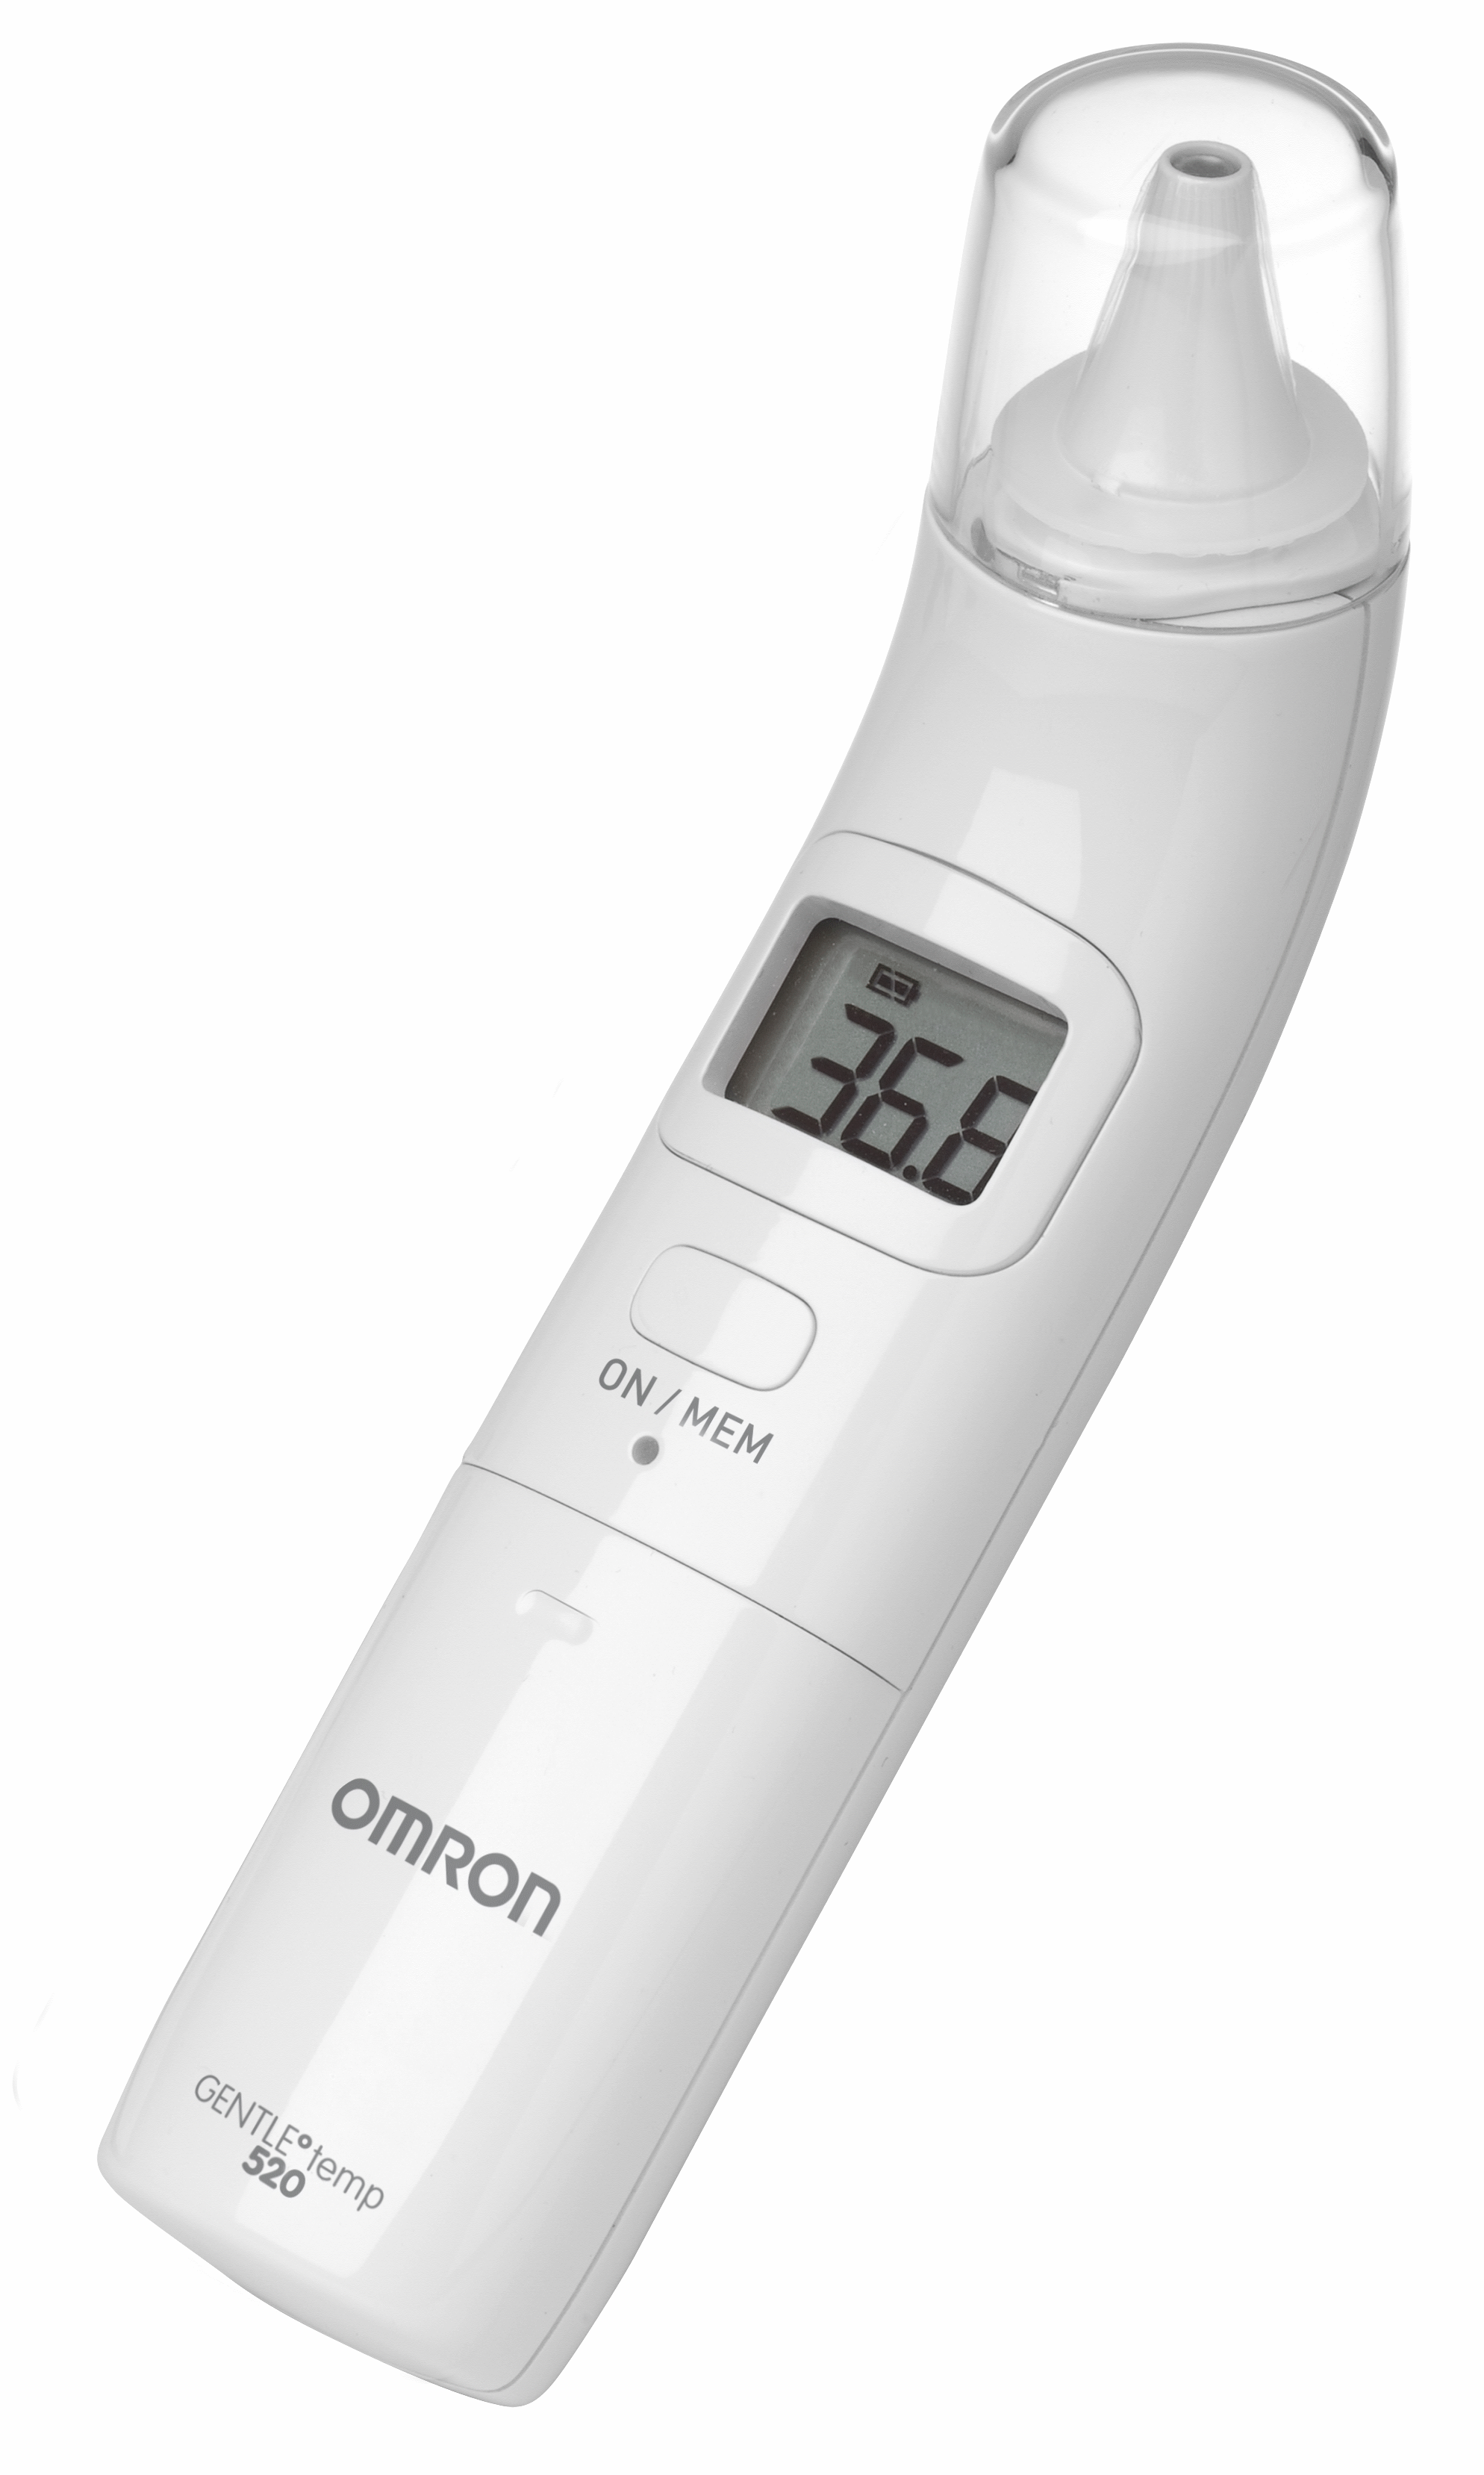 Omron MC 520 Ohr-Thermometer für 29 € / Girodmedical